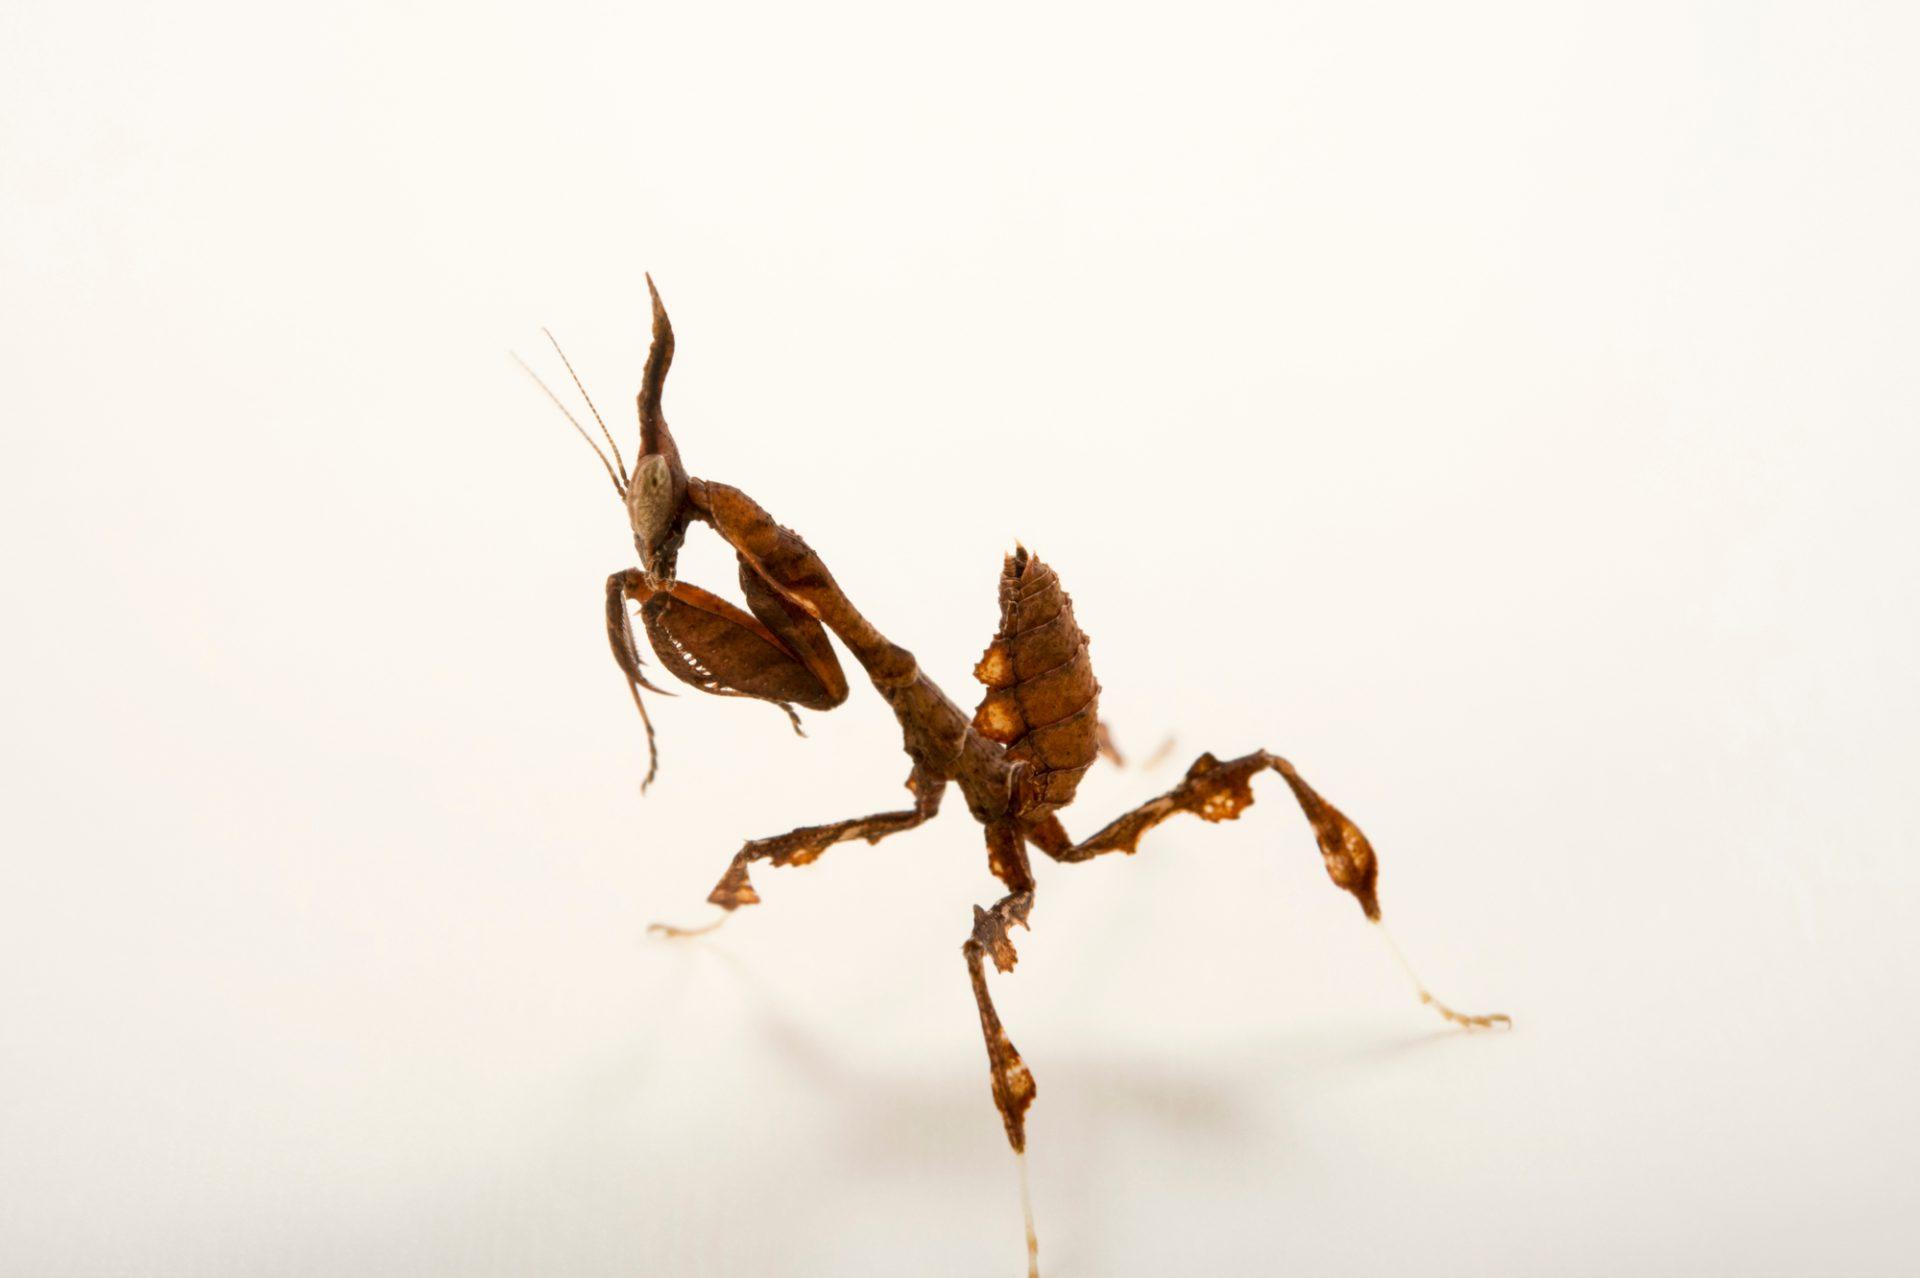 Photo: Ghost mantis (Phyllocrania paradoxa) at the Budapest Zoo.